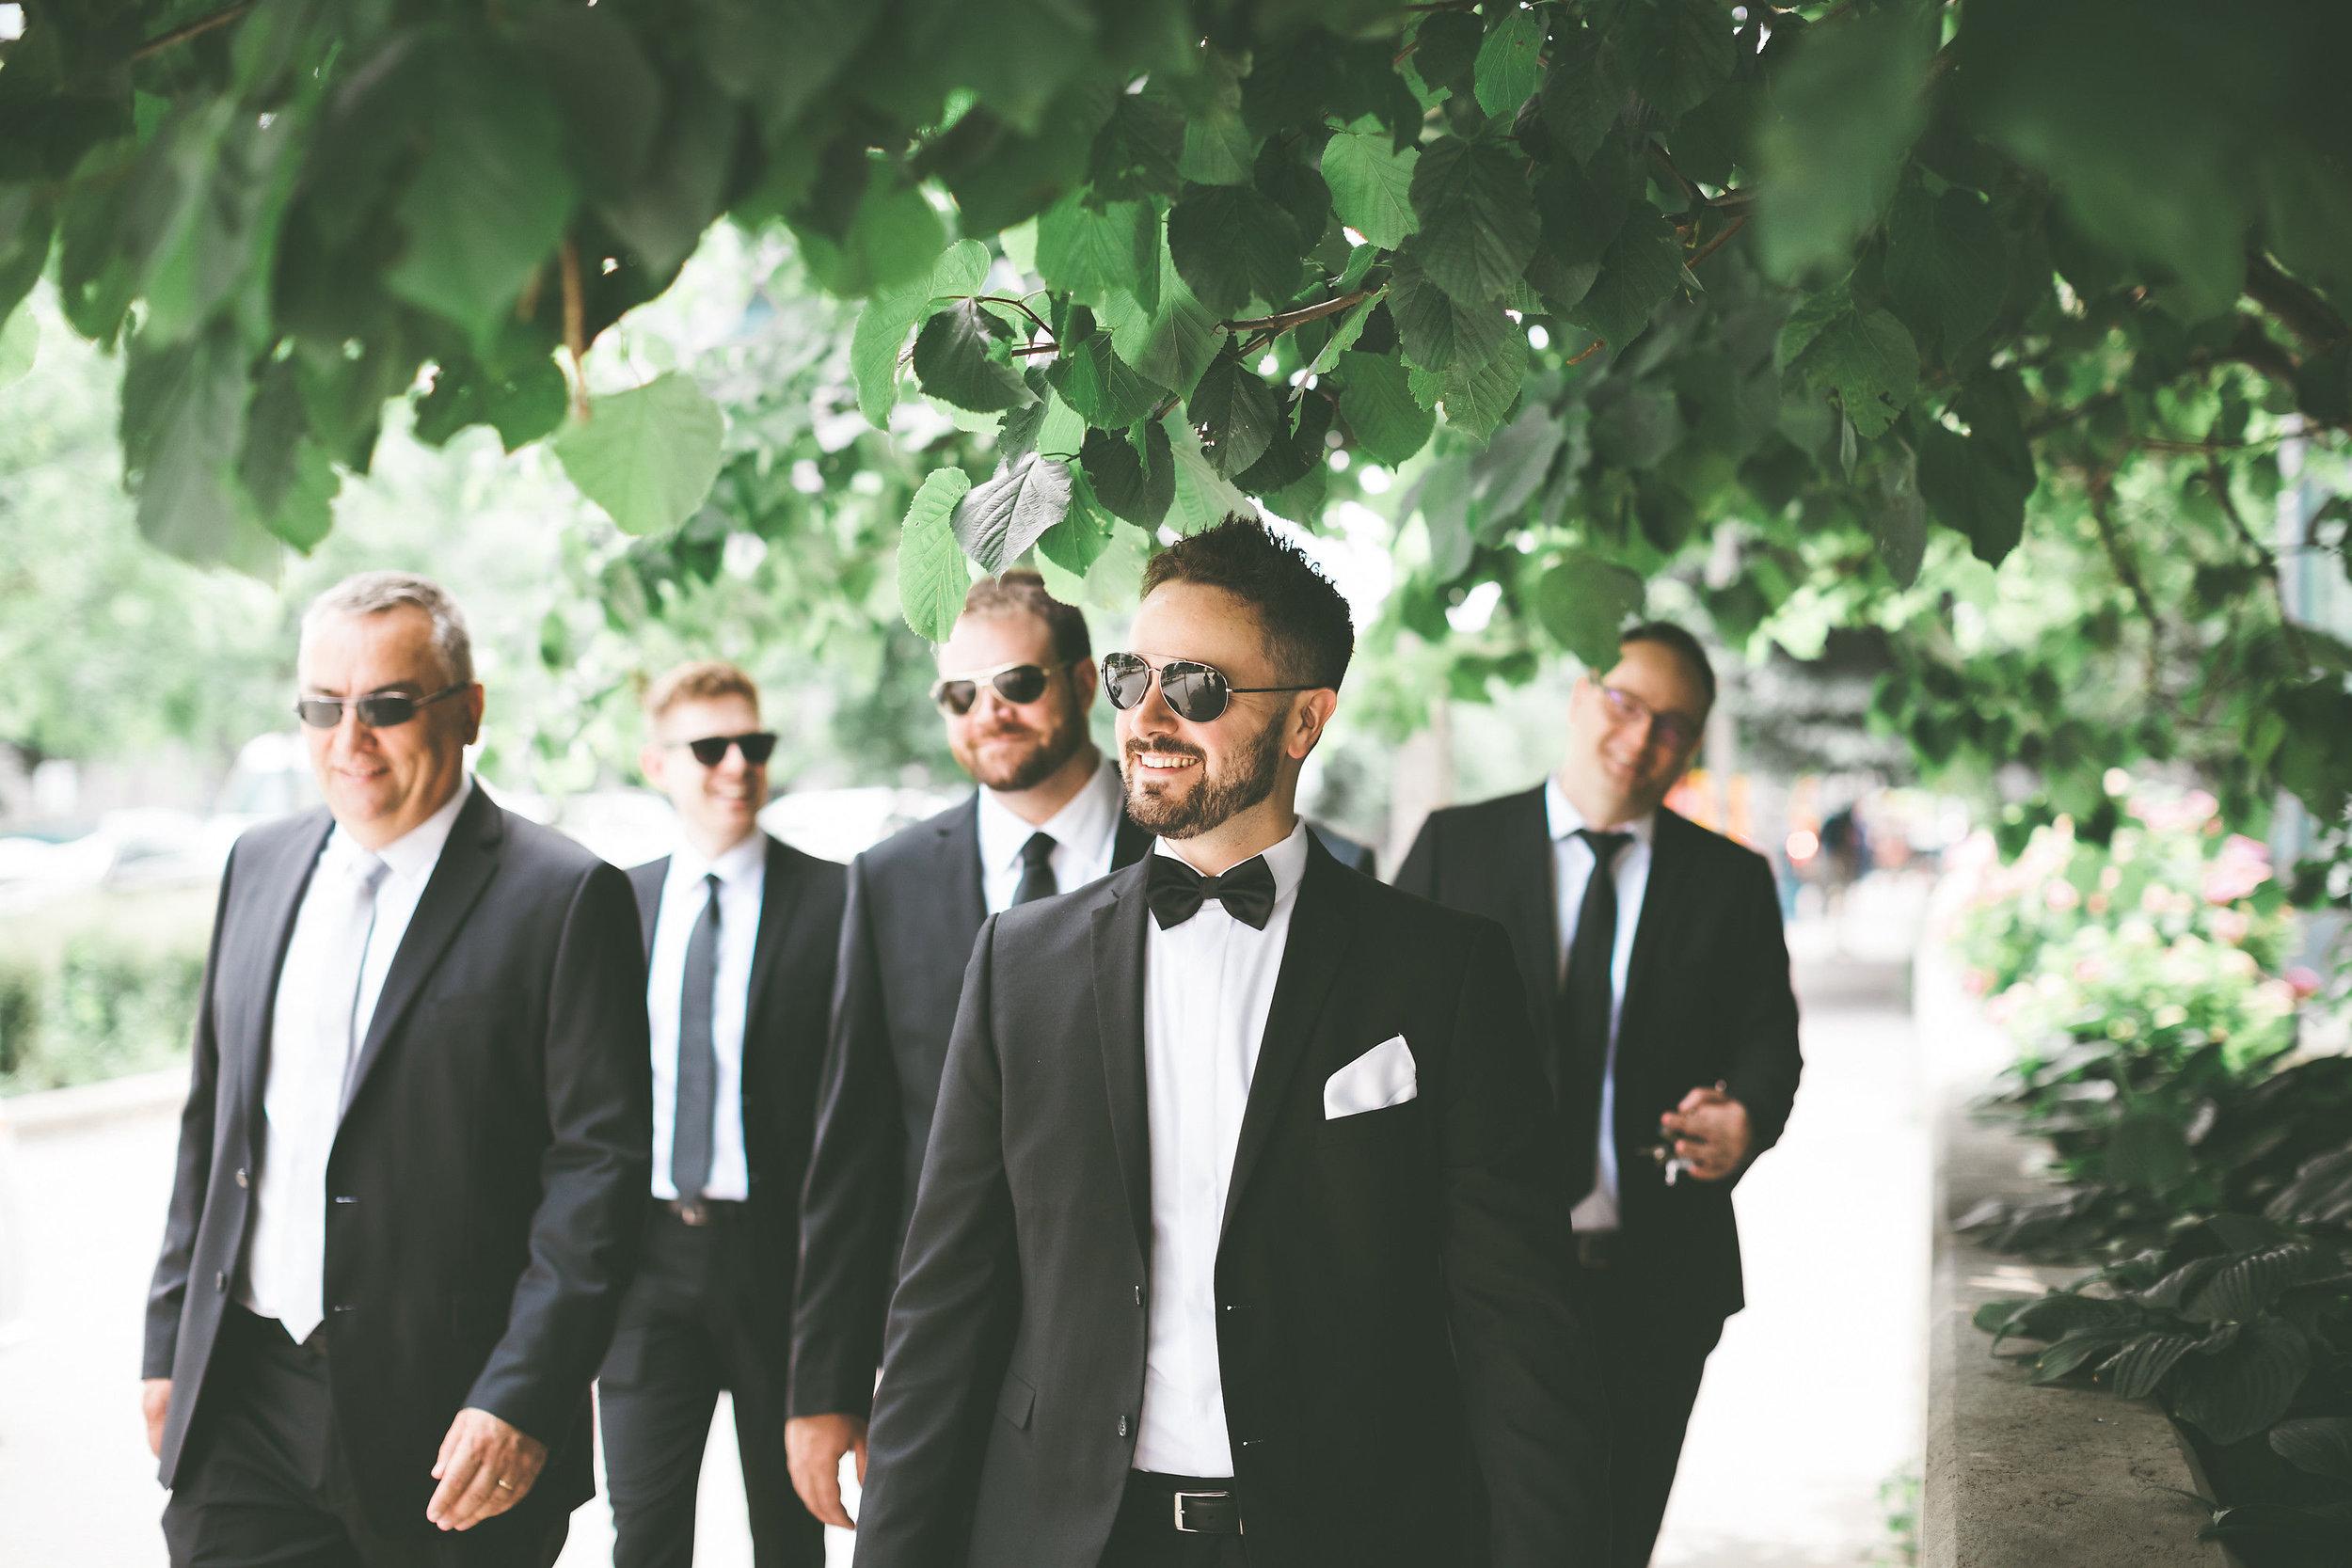 gosia___mike_wedding___lifesreel_danielcaruso___0353.jpg